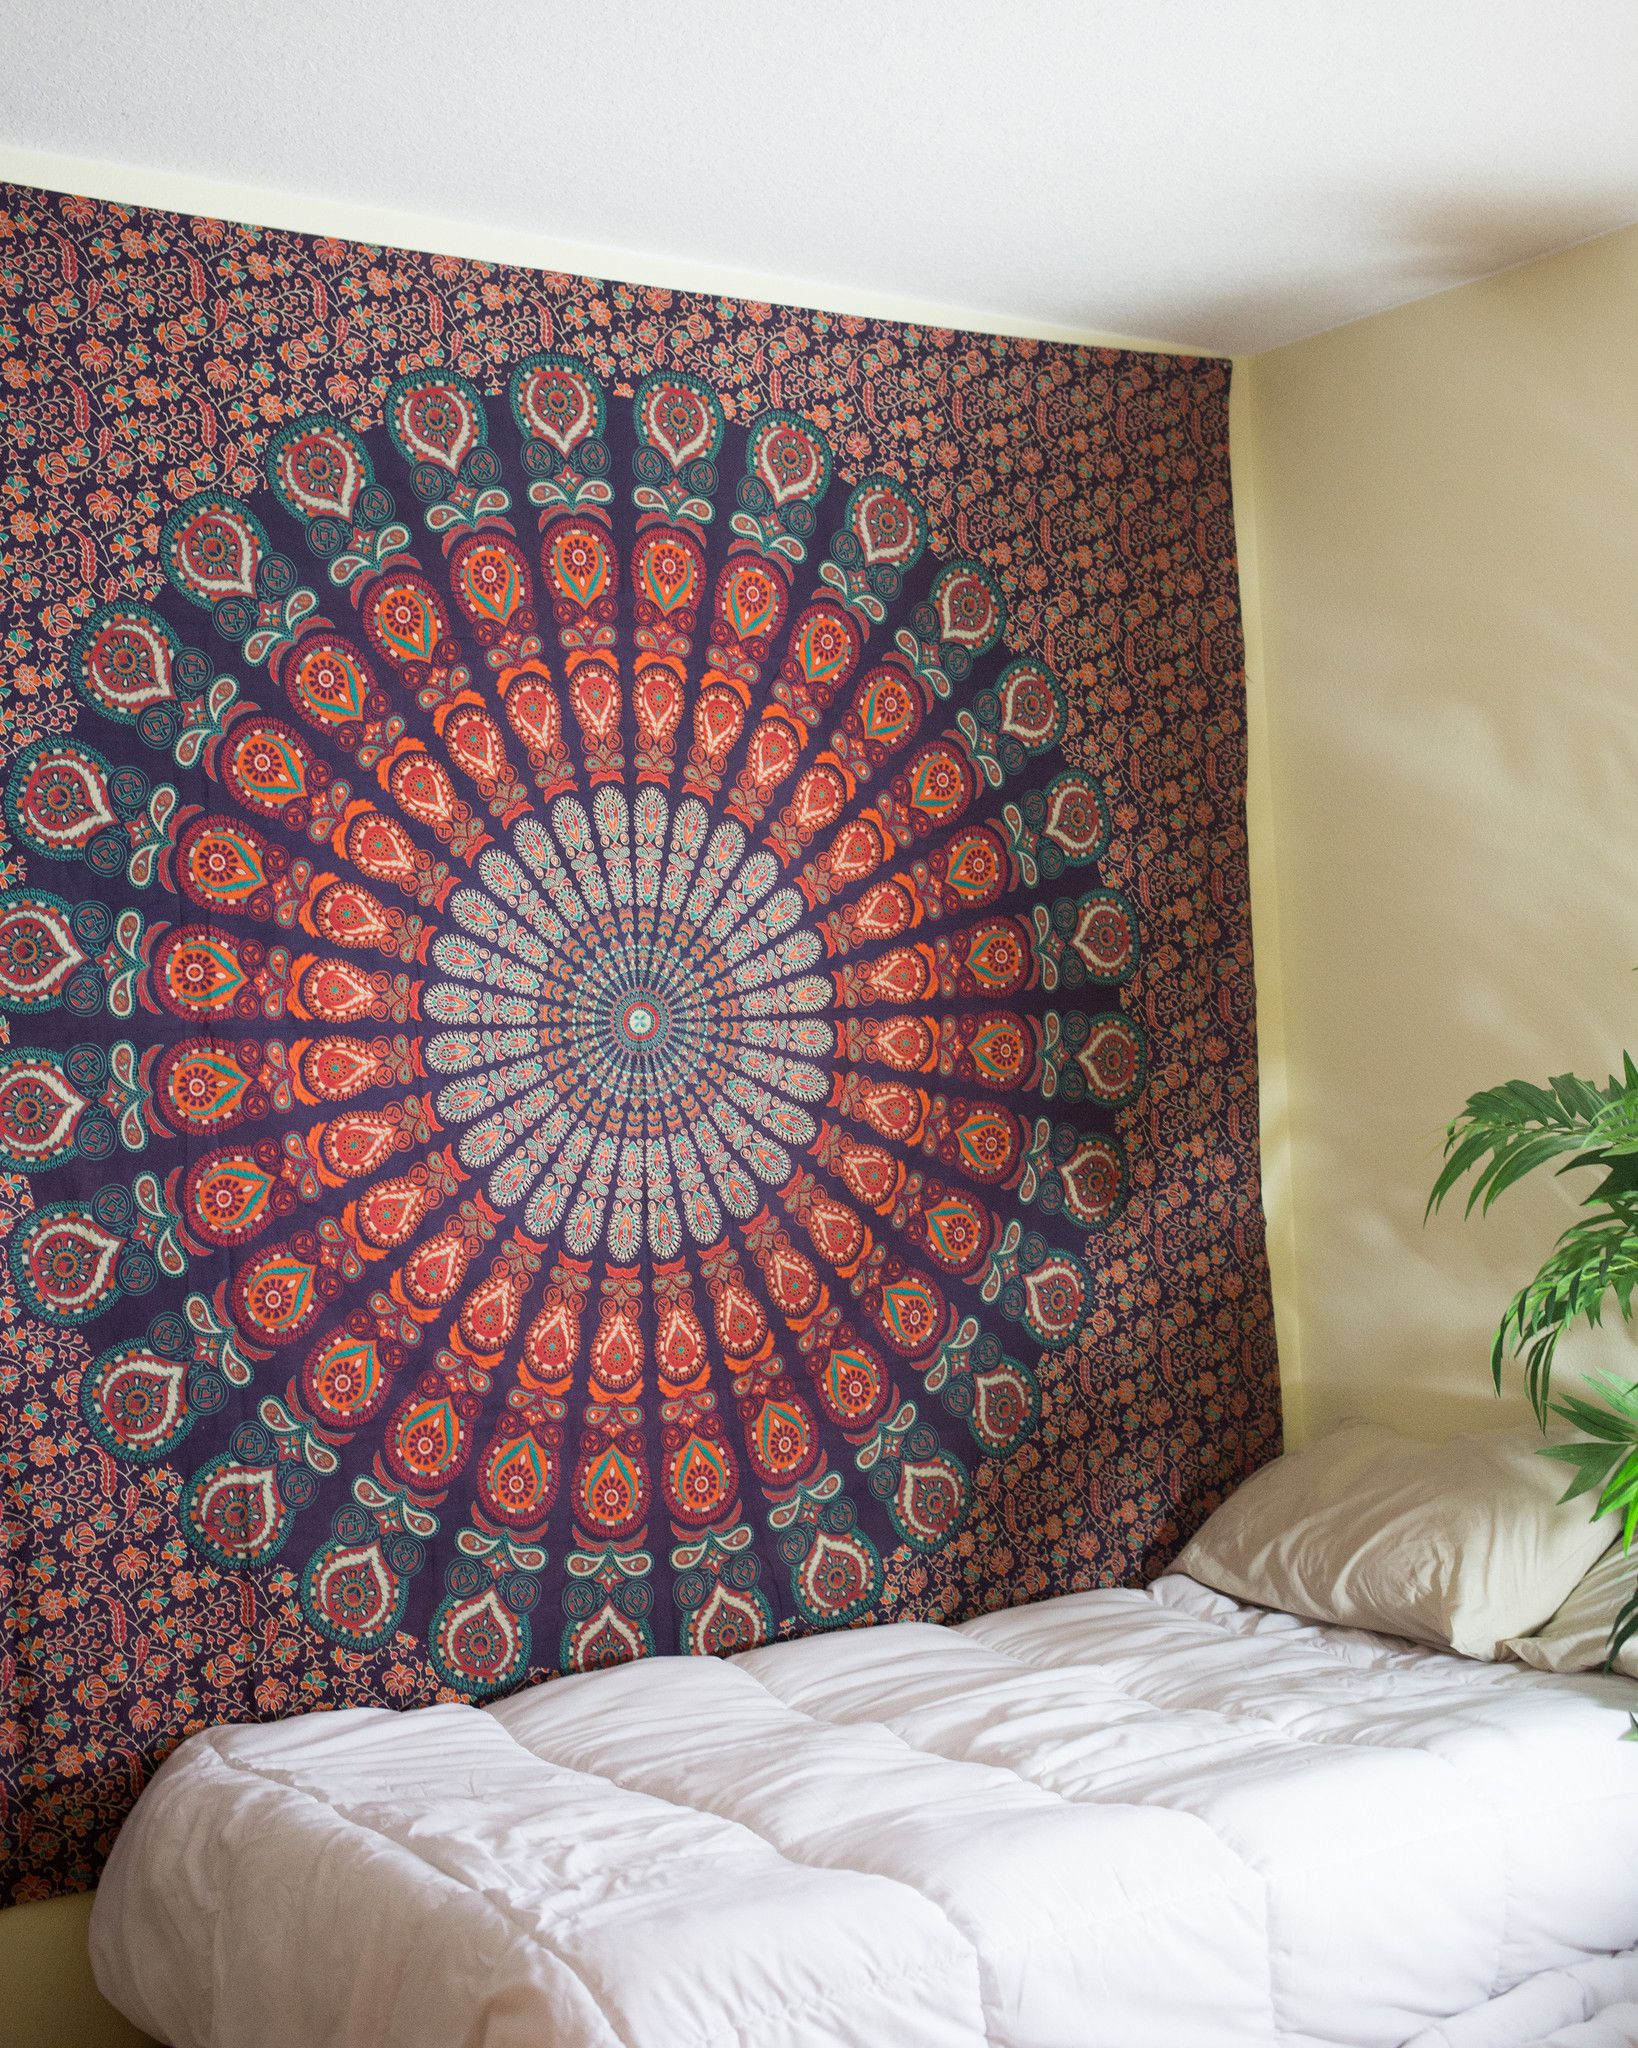 Blue Multi Plum and Blow Medallion Wall Tapestry  Hippie Bedding ThrowOrange   Navy Blue Mandala Tapestry  24 99   www thebohemianshop  . Orange And Navy Blue Bedroom. Home Design Ideas